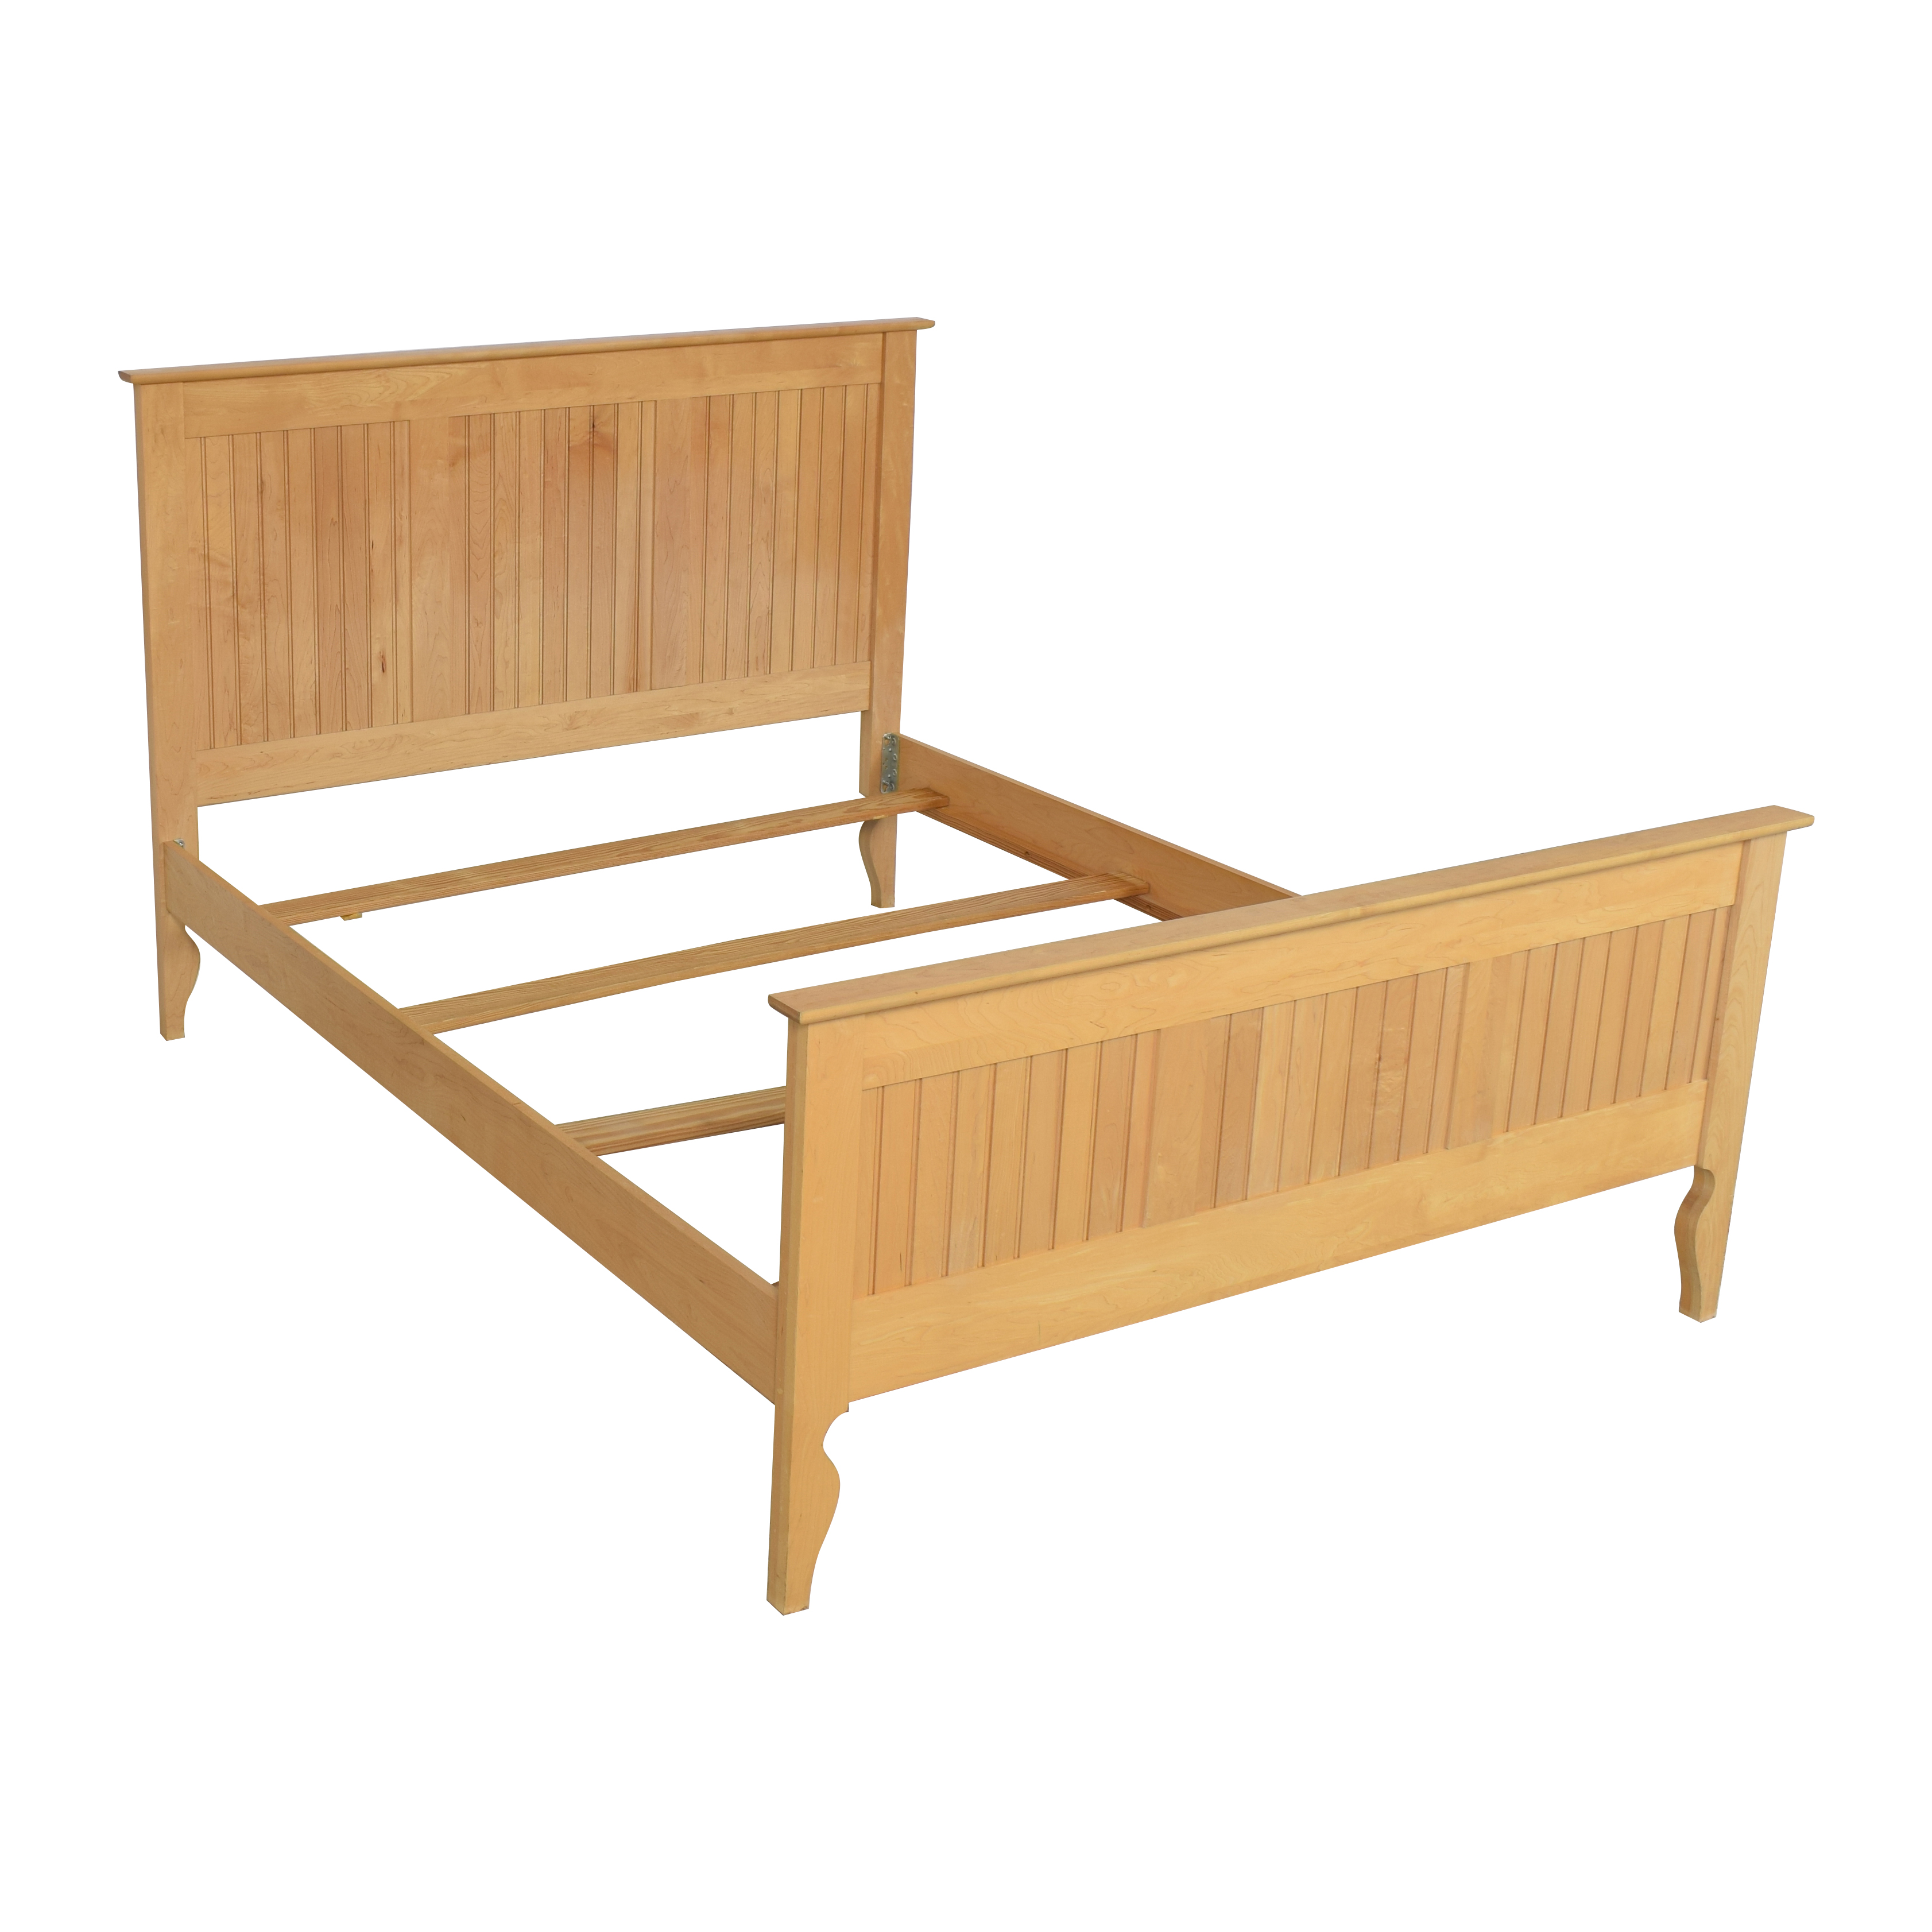 Crate & Barrel Crate & Barrel Wooden Queen Bed discount